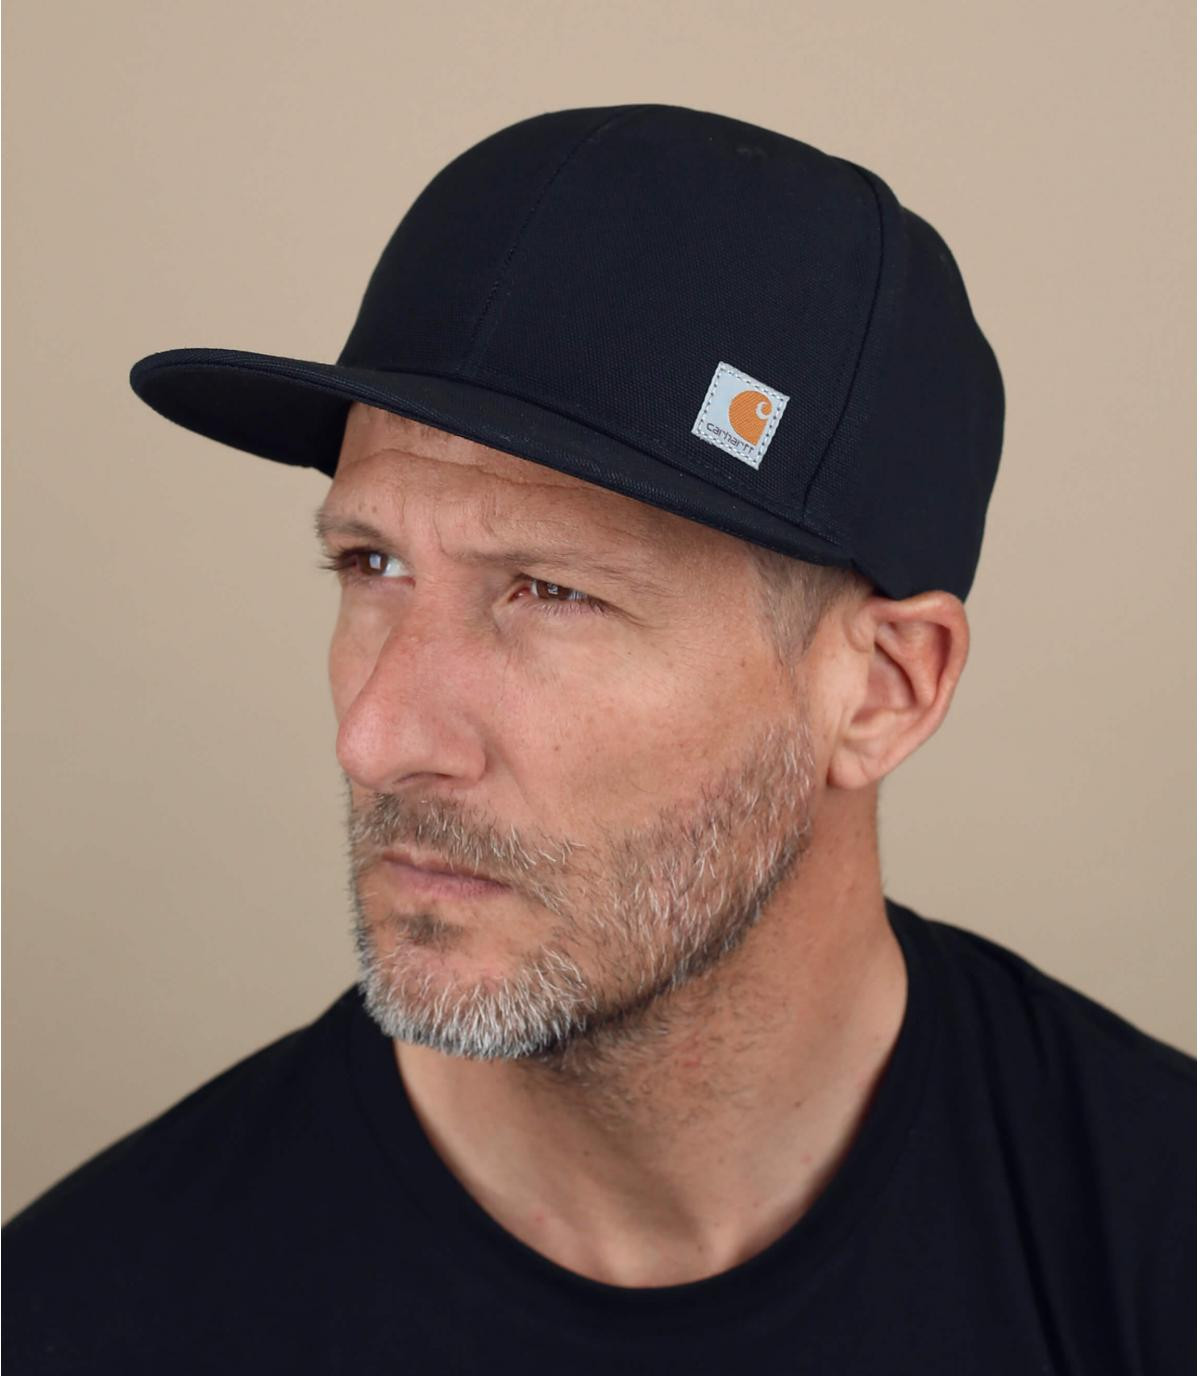 Zwarte Carhartt cap